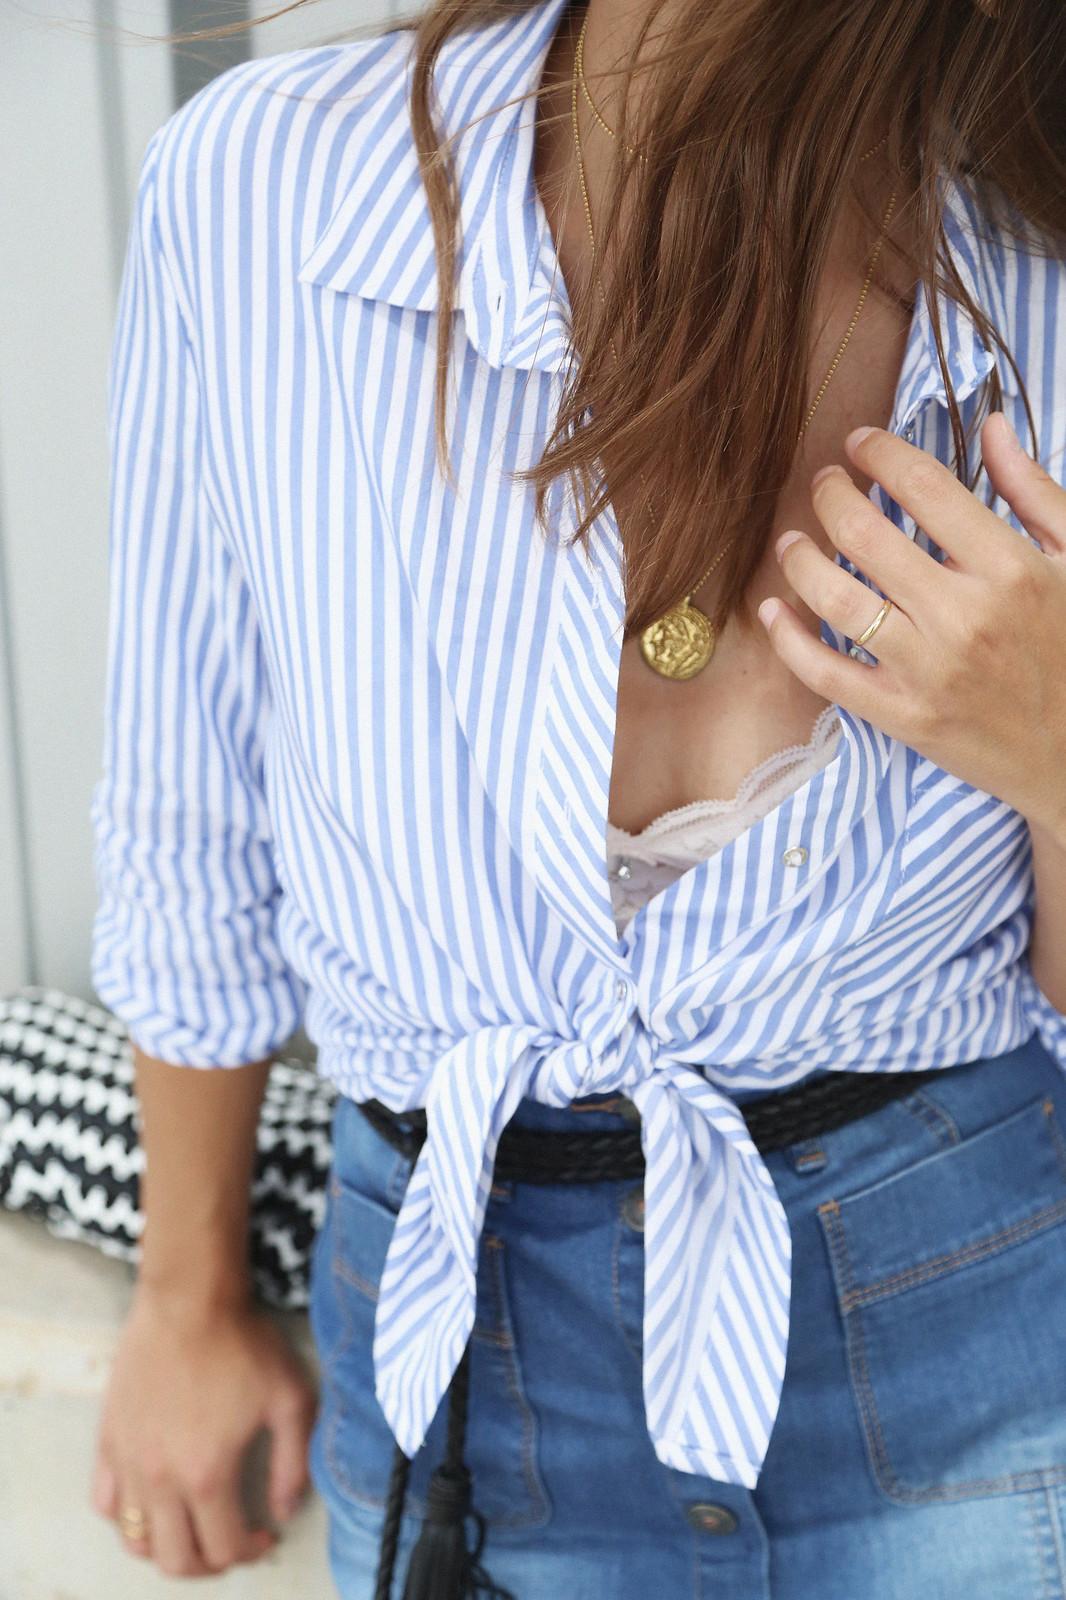 jessie chanes seams for a desire denim skirt stripes shirt-11